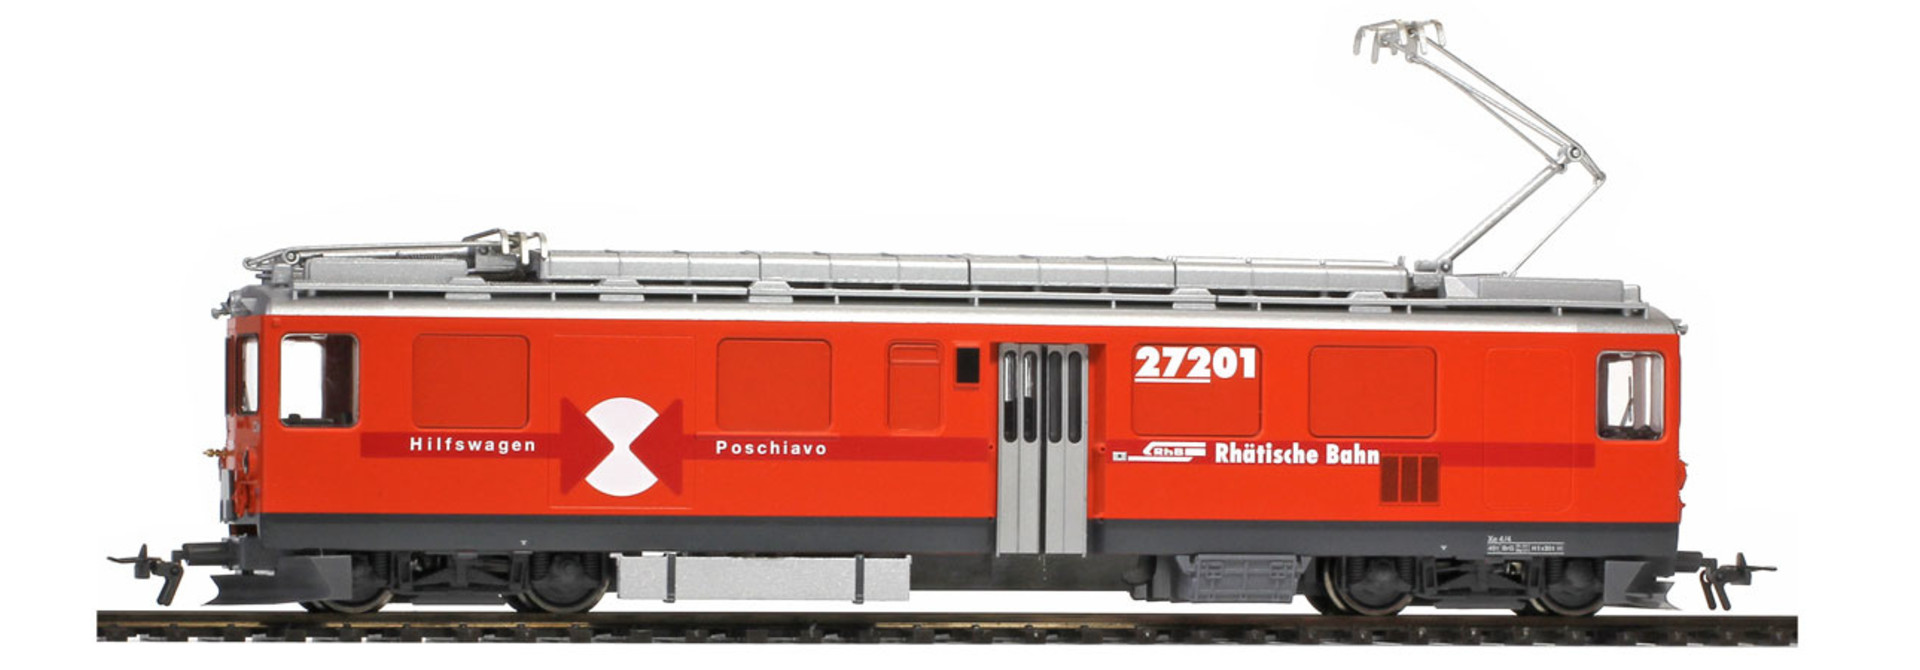 1266153 RhB Xe 4/4 272 01 Bahndiensttriebwagen